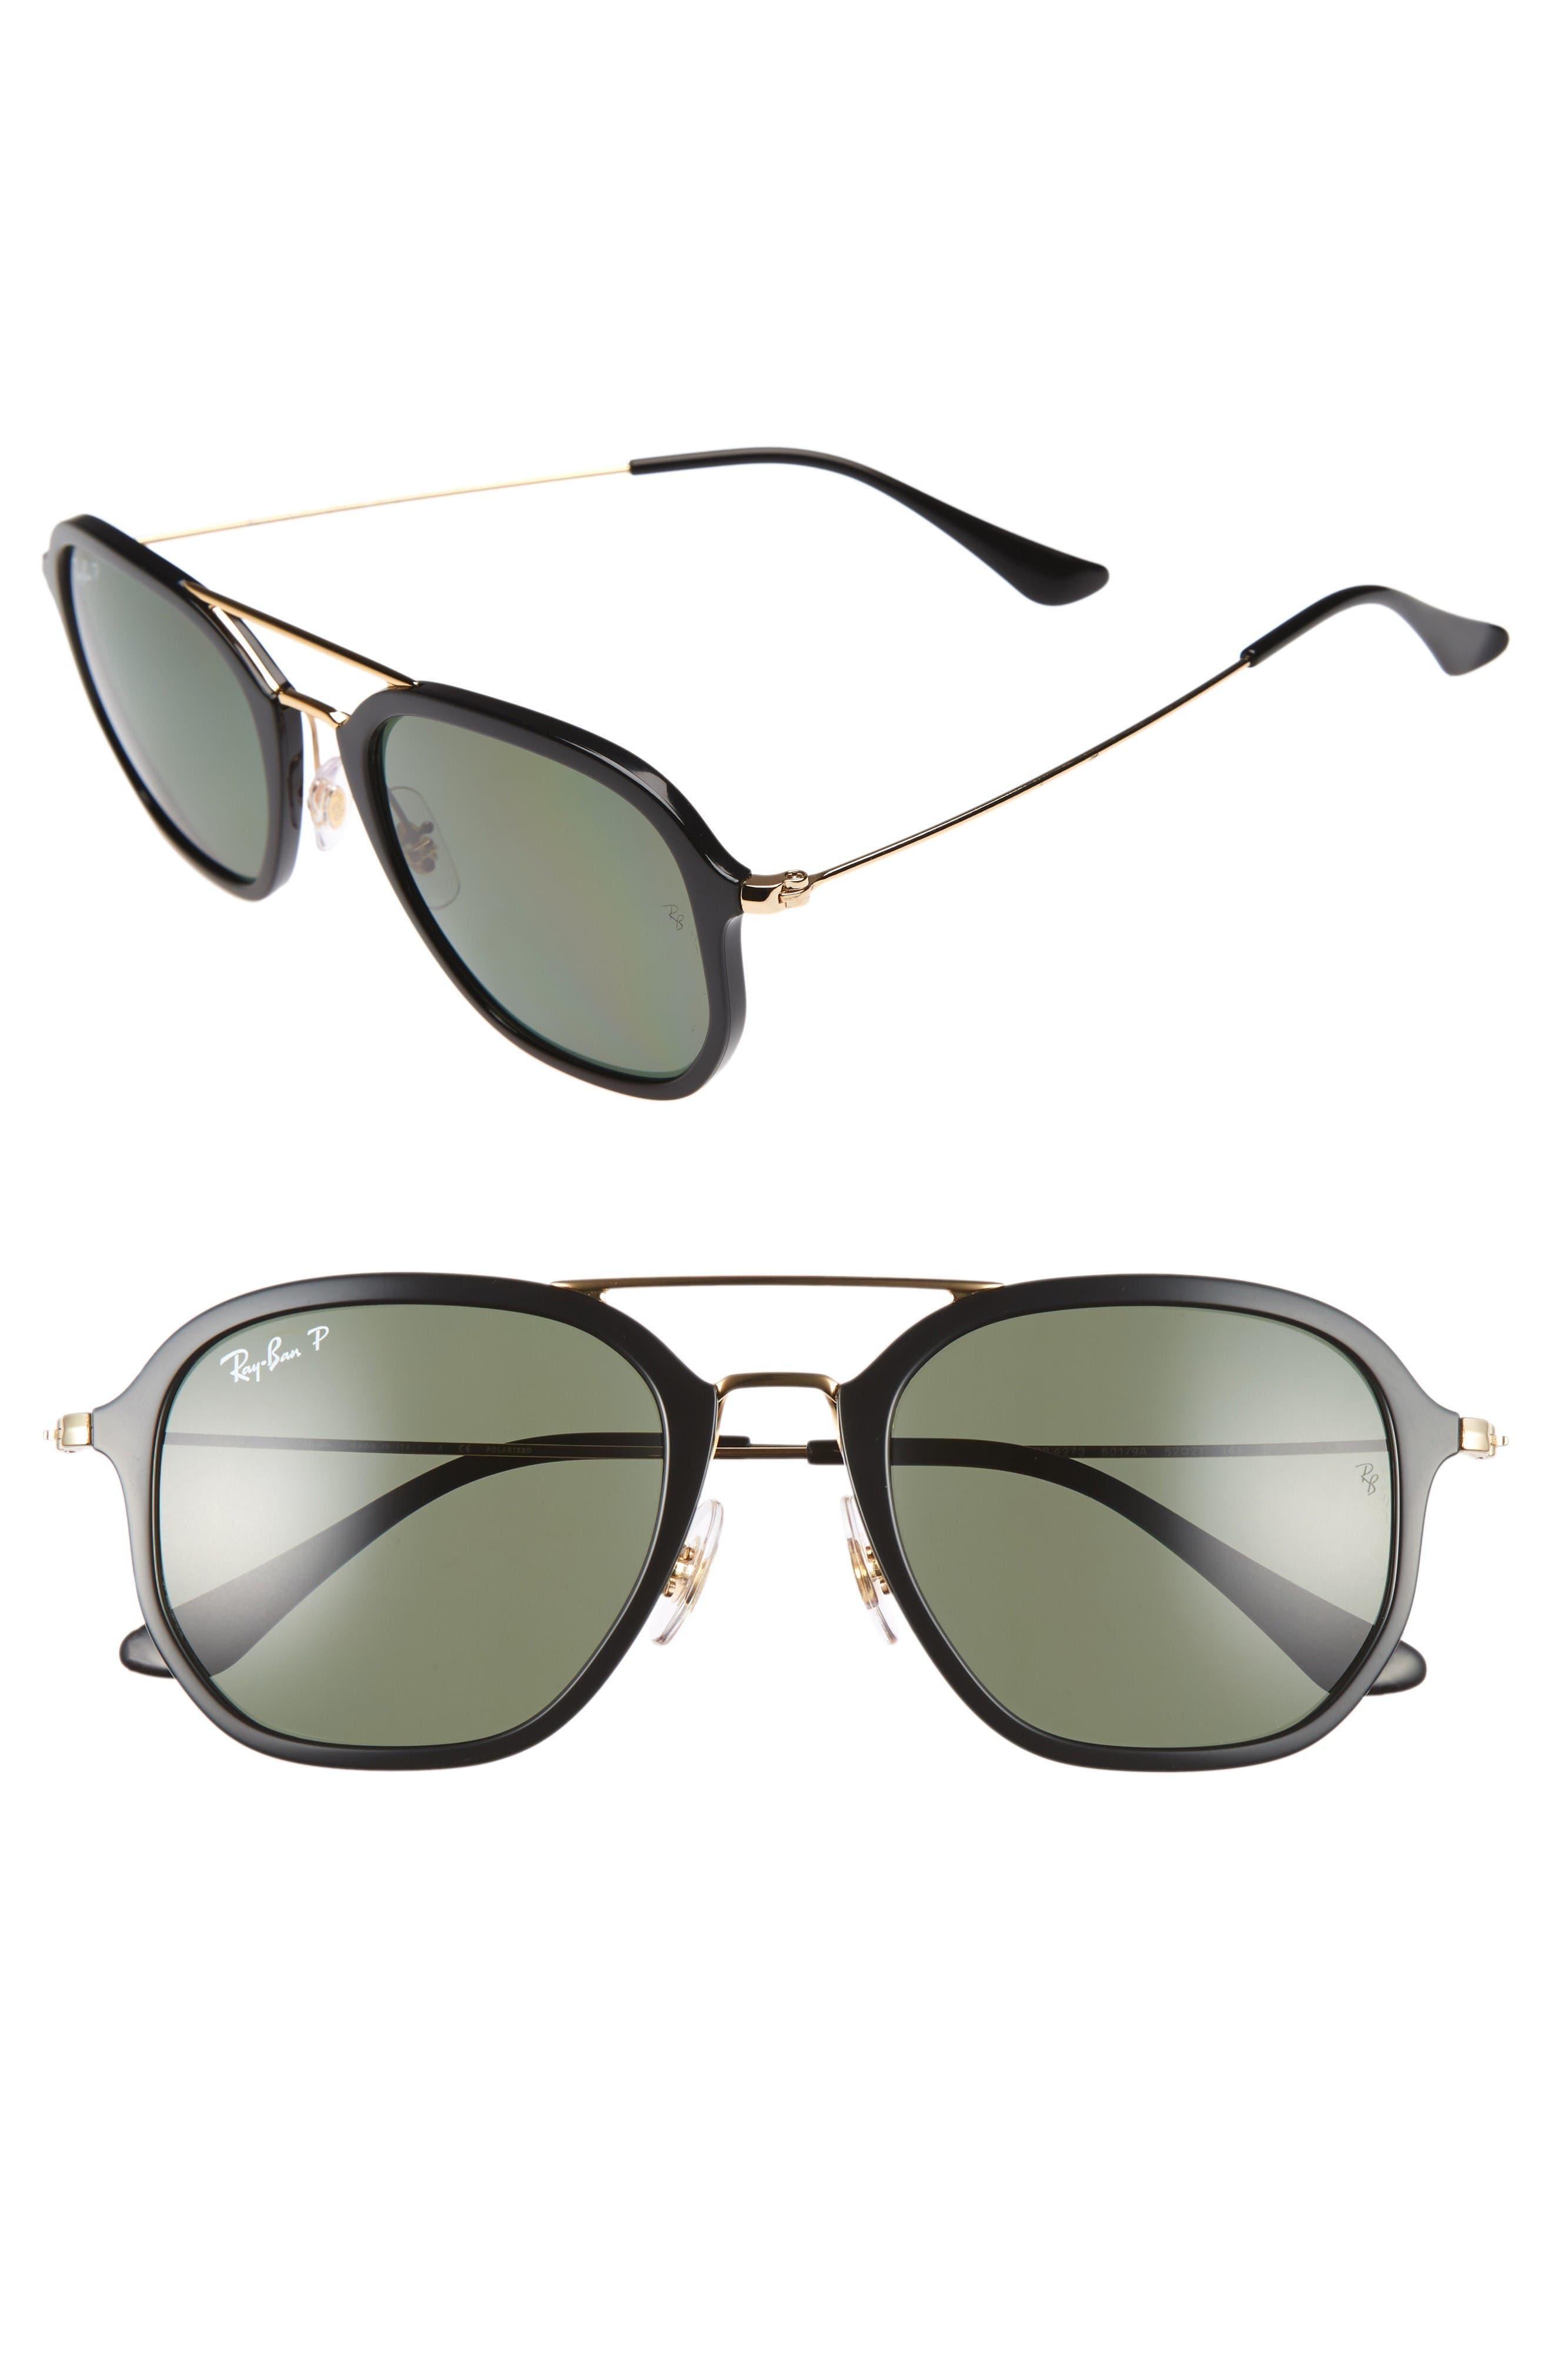 Ray-Ban Highstreet 52mm Polarized Aviator Sunglasses